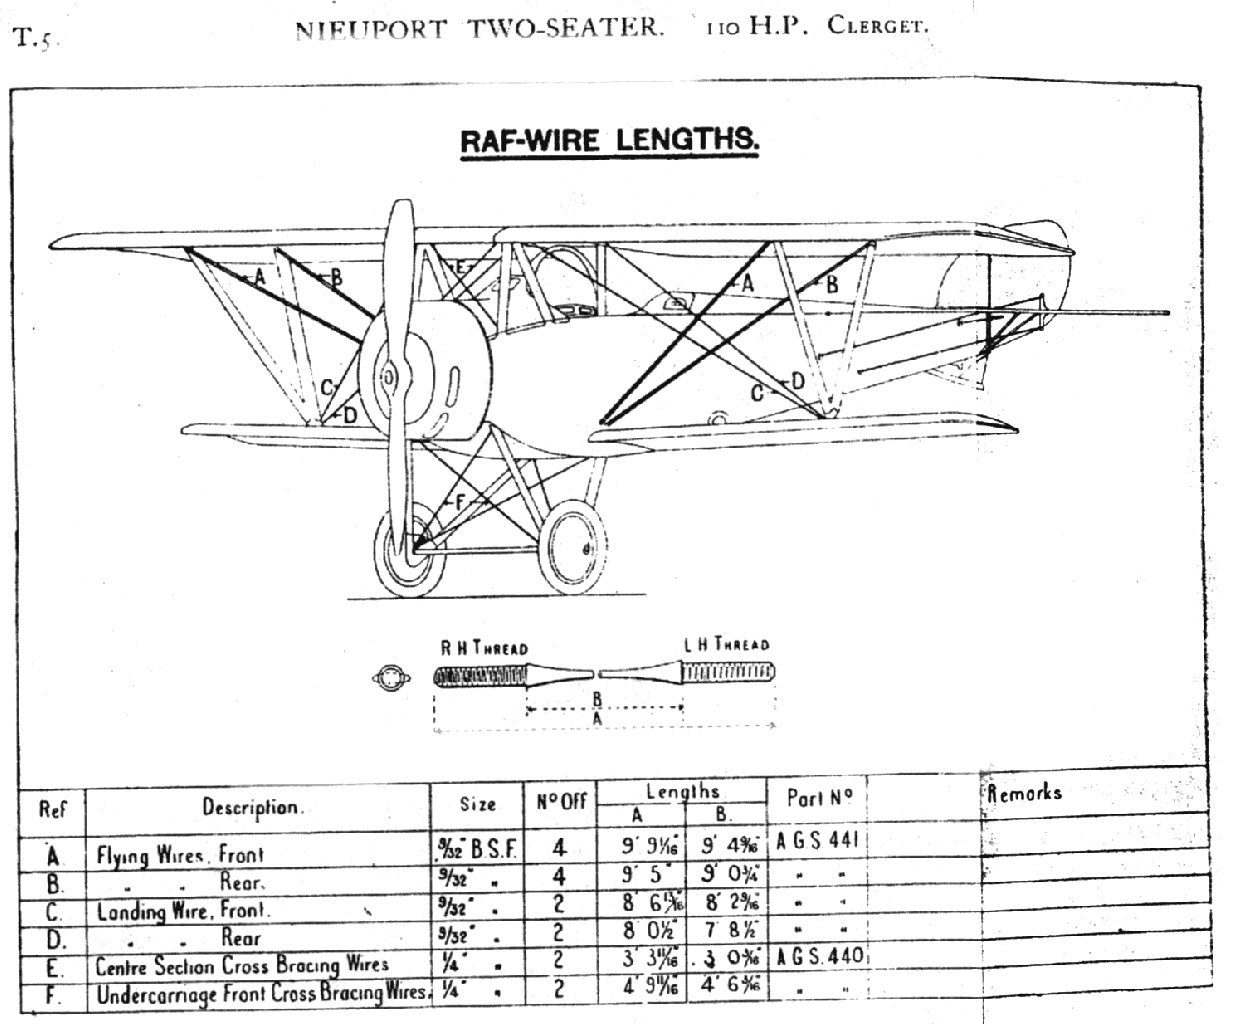 File Nieuport 12 Rigging Diagram - Cable Lengths Jpg